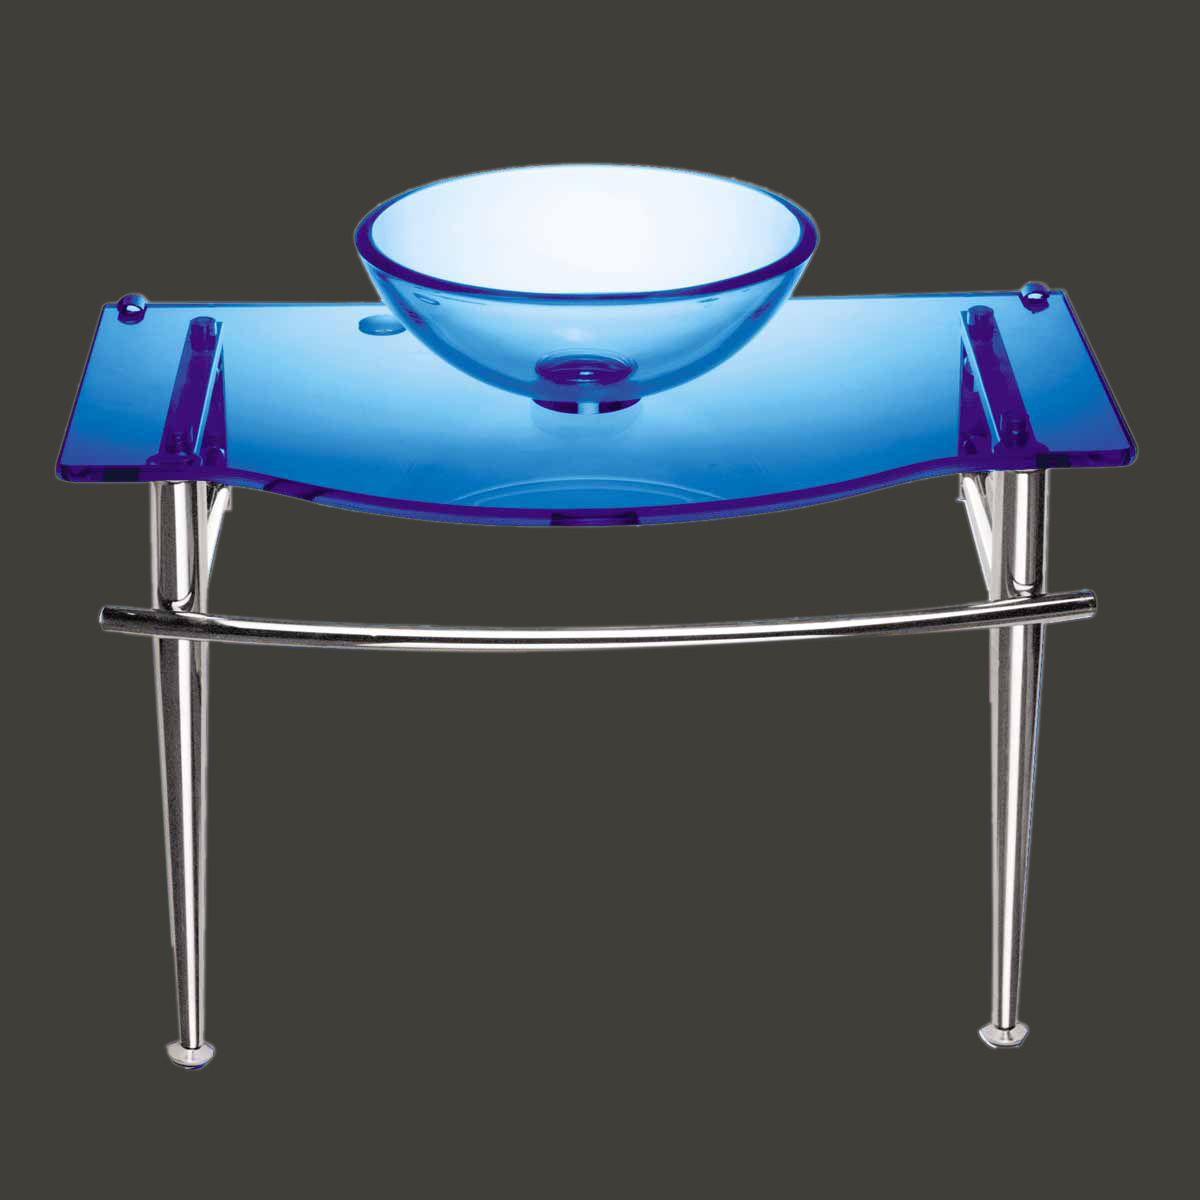 Children Bathroom Console Sink Blue Glass Vanity Wall Mount